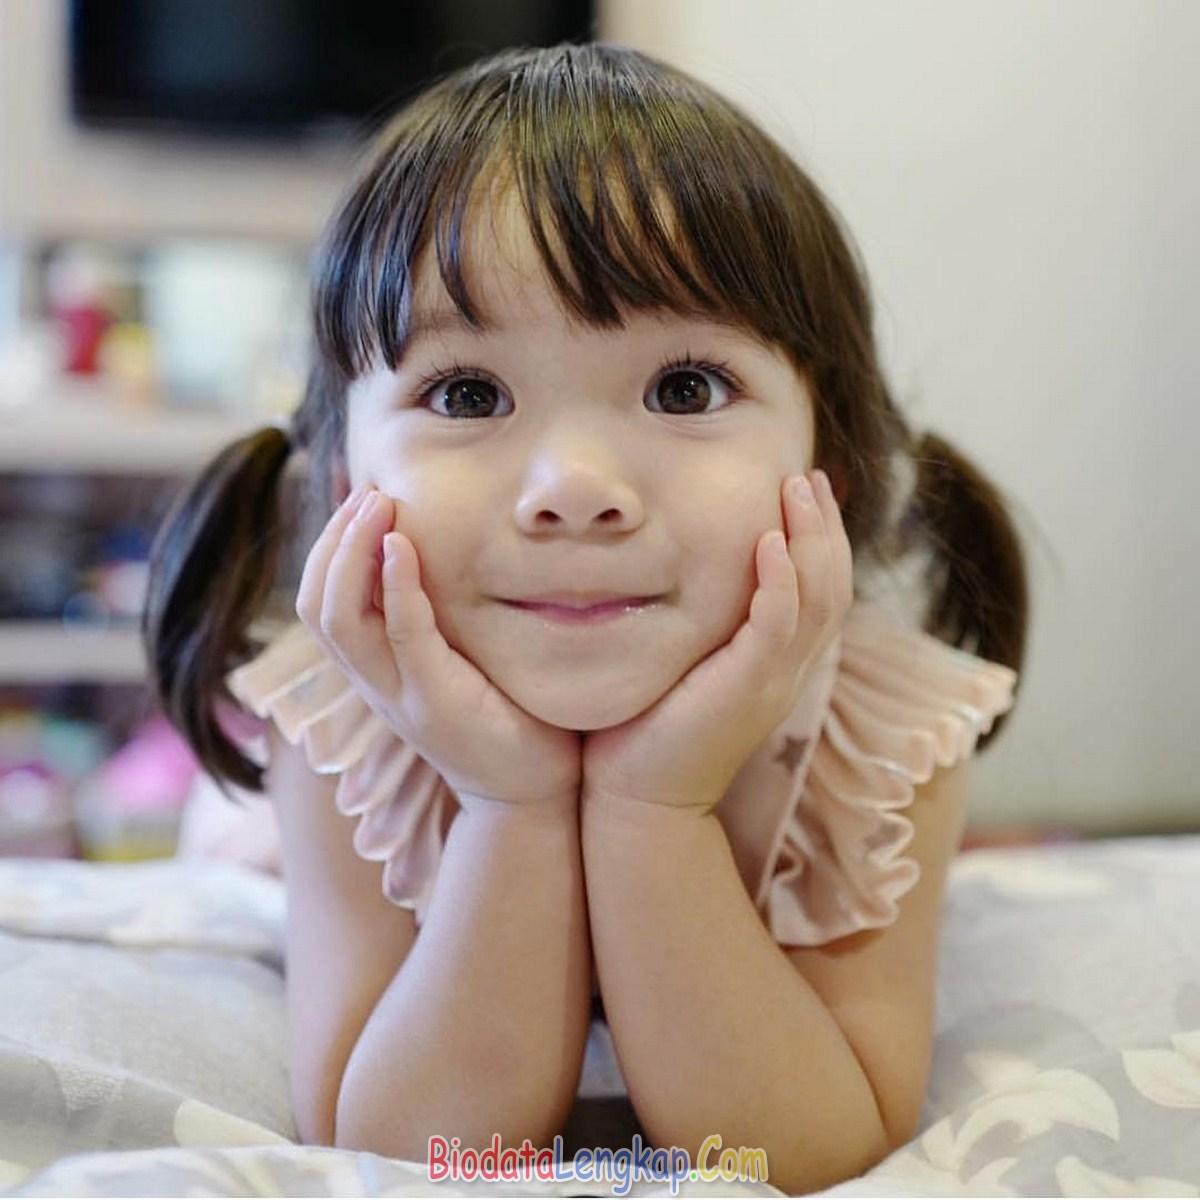 Anak Kecil Lucu Imut Dan Cantik